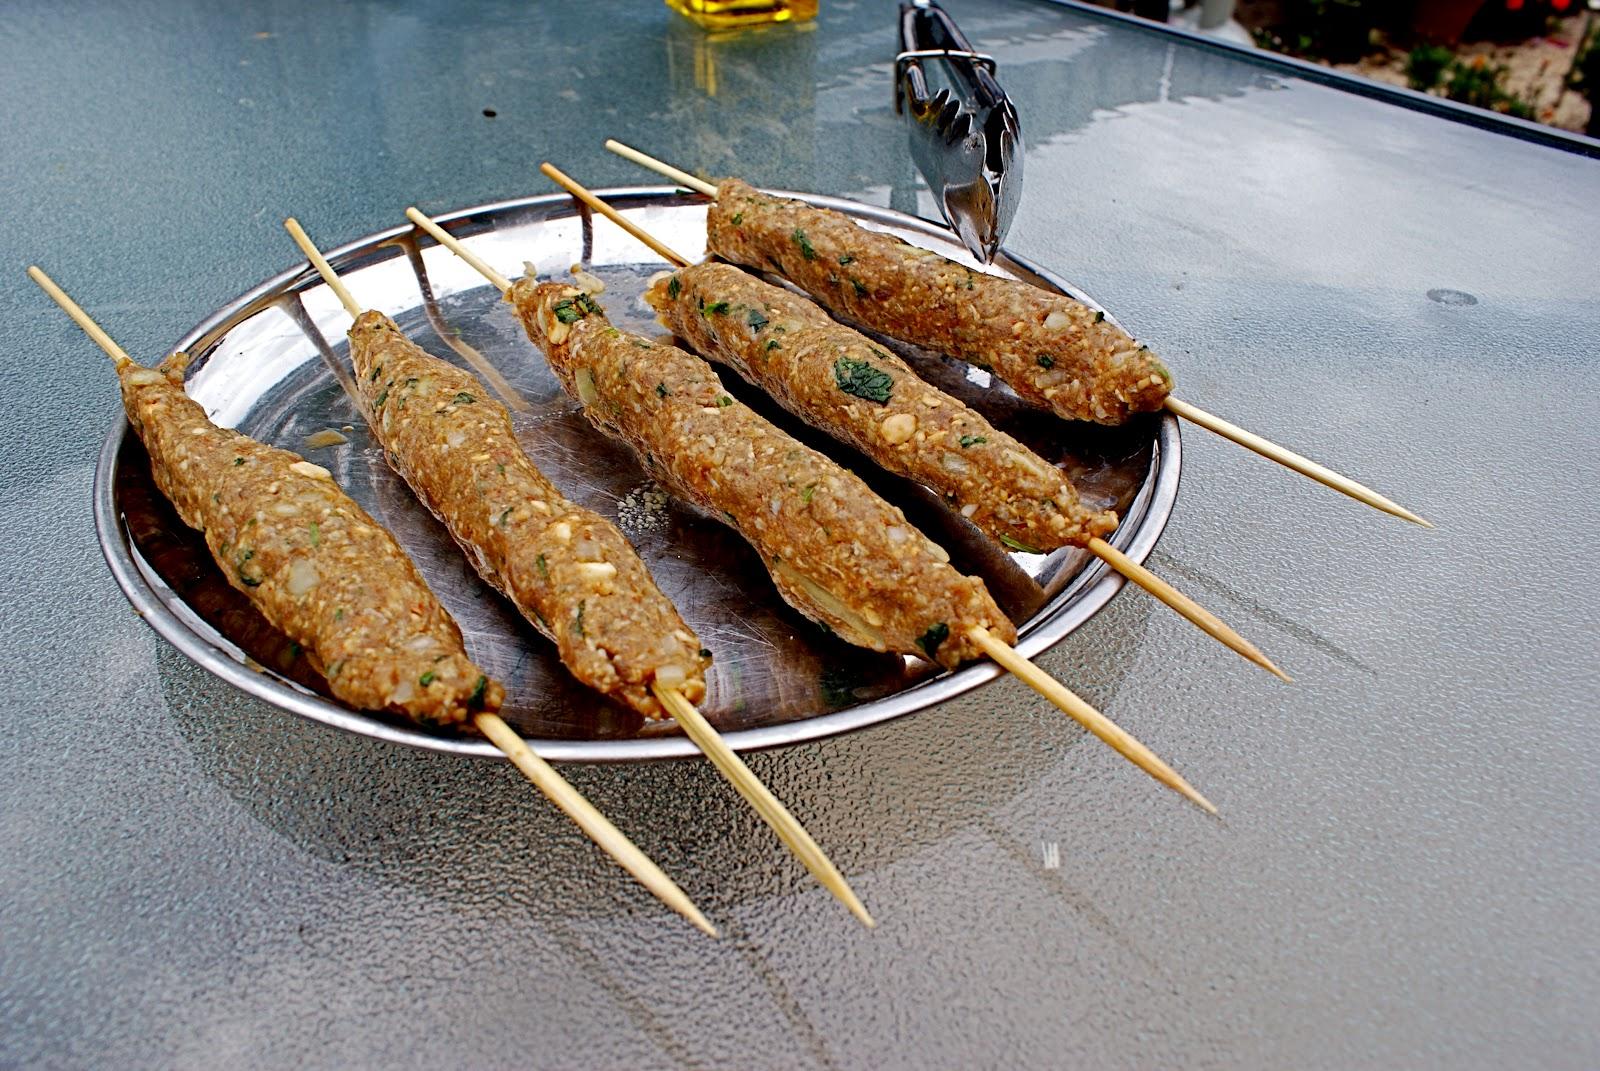 Hakket lammekød på grillspyd